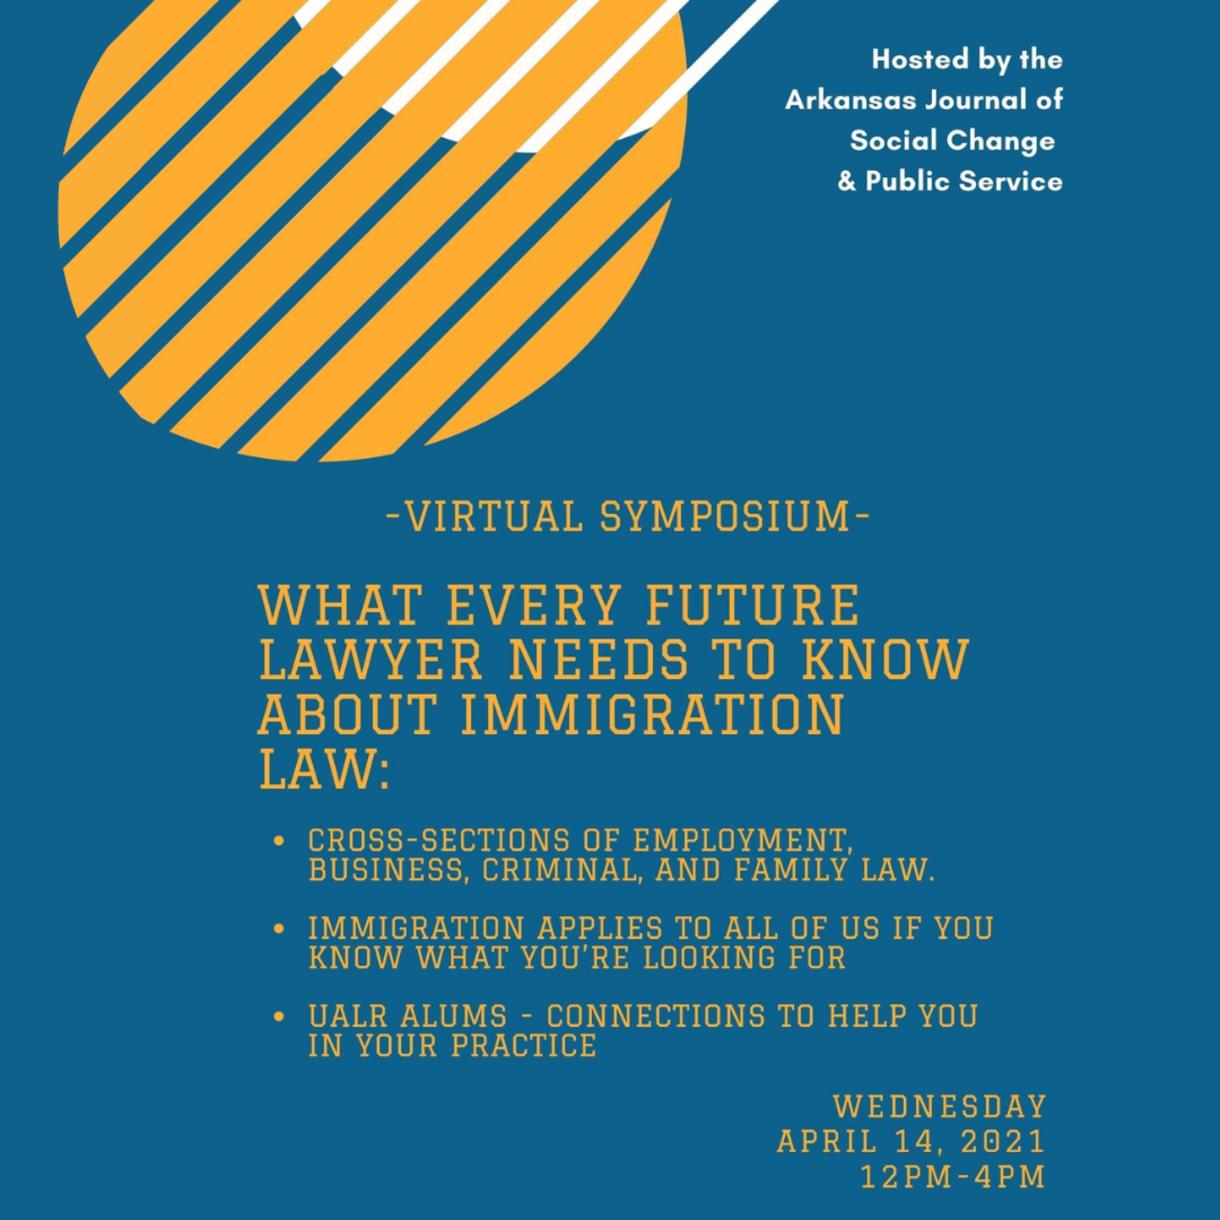 Arkansas Journal of Social Change & Public Service Virtual Symposium, 4/14, Noon-4p.m.